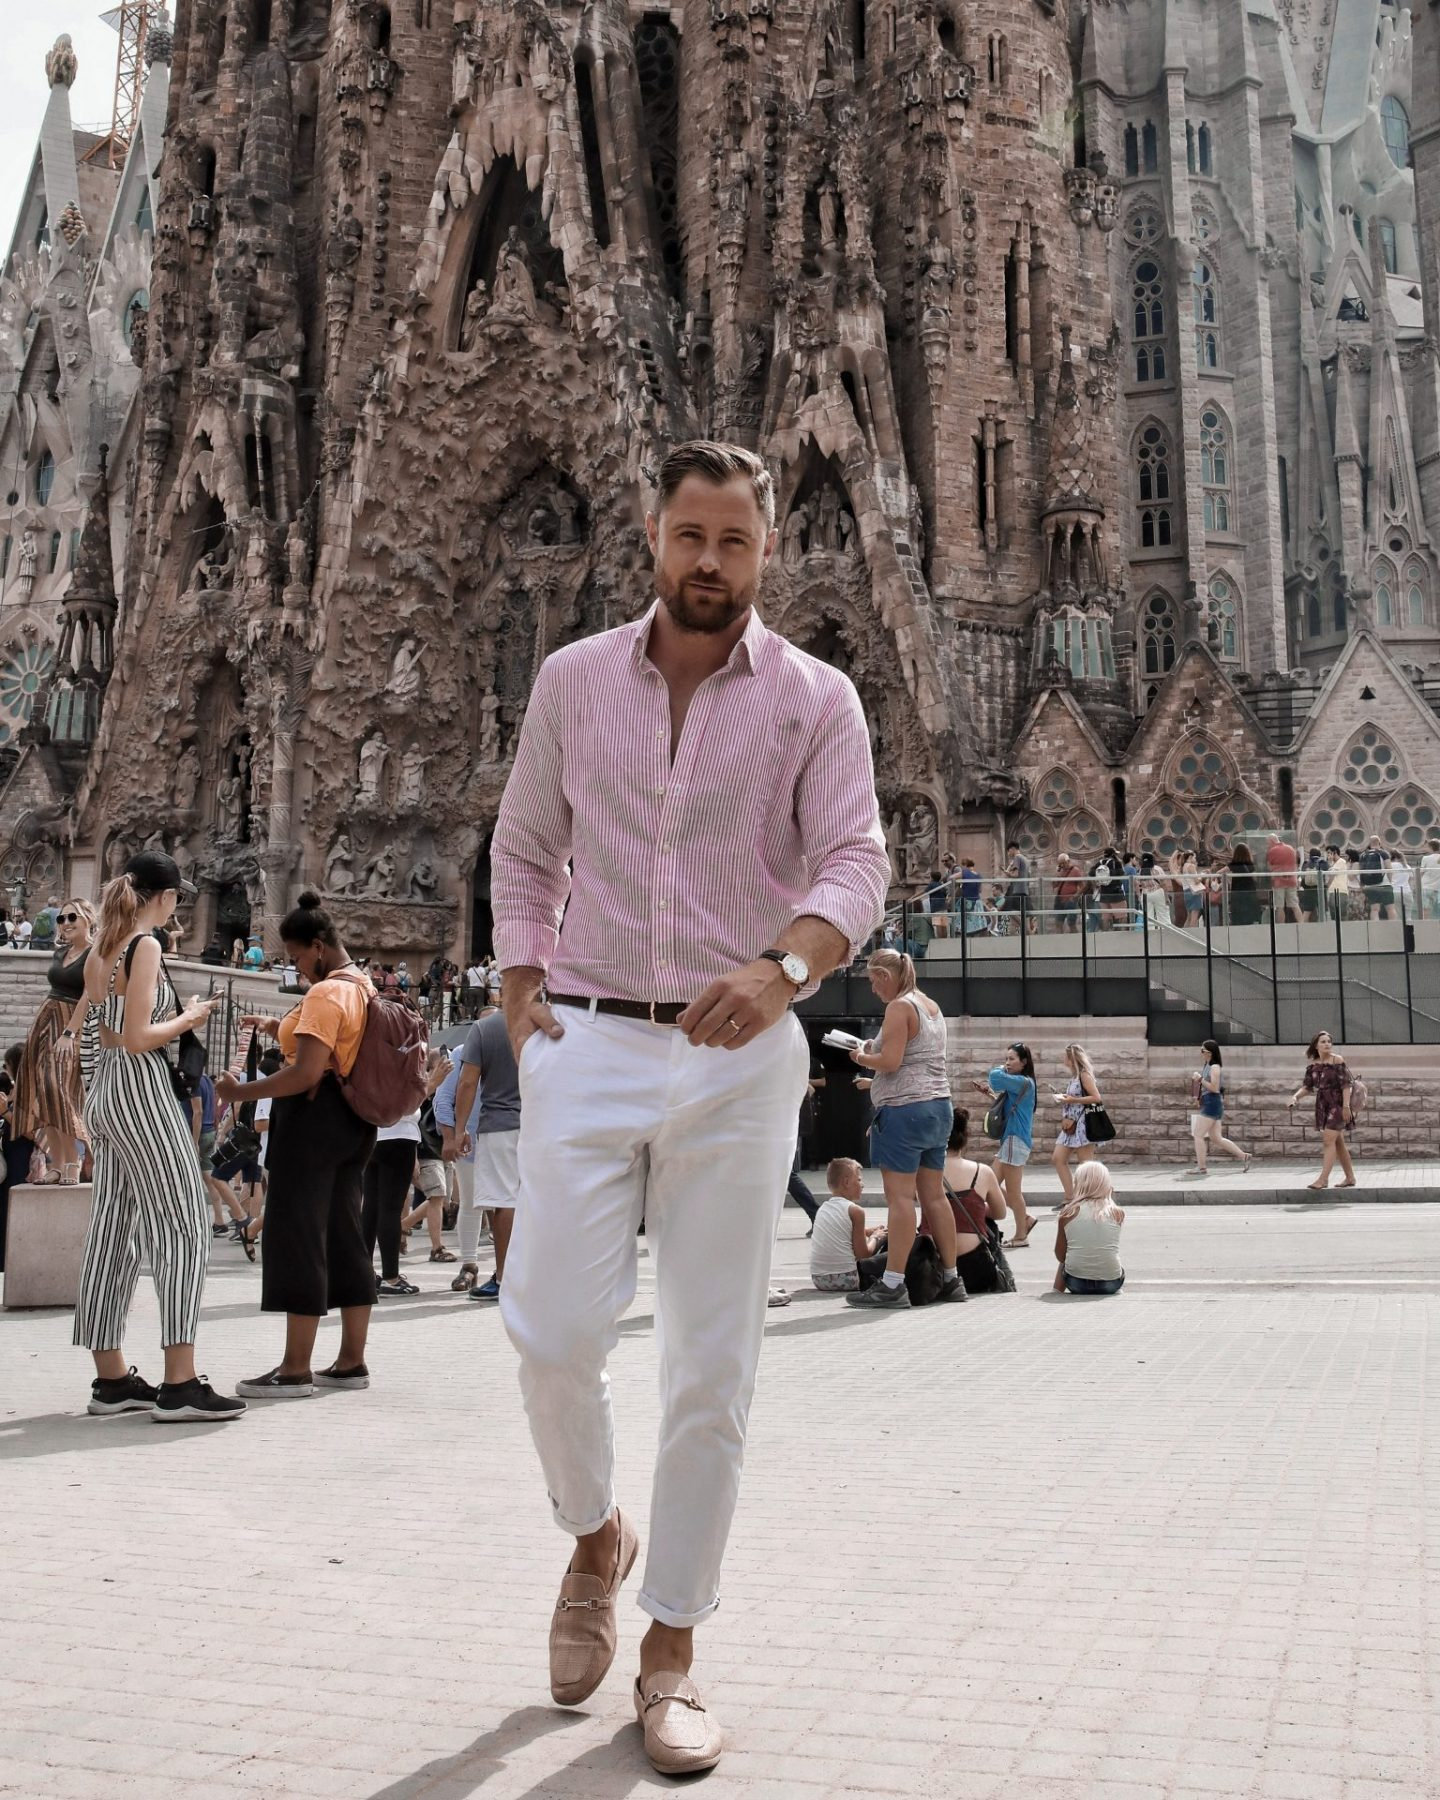 Barcelona City Guide Twenty First Century Gent